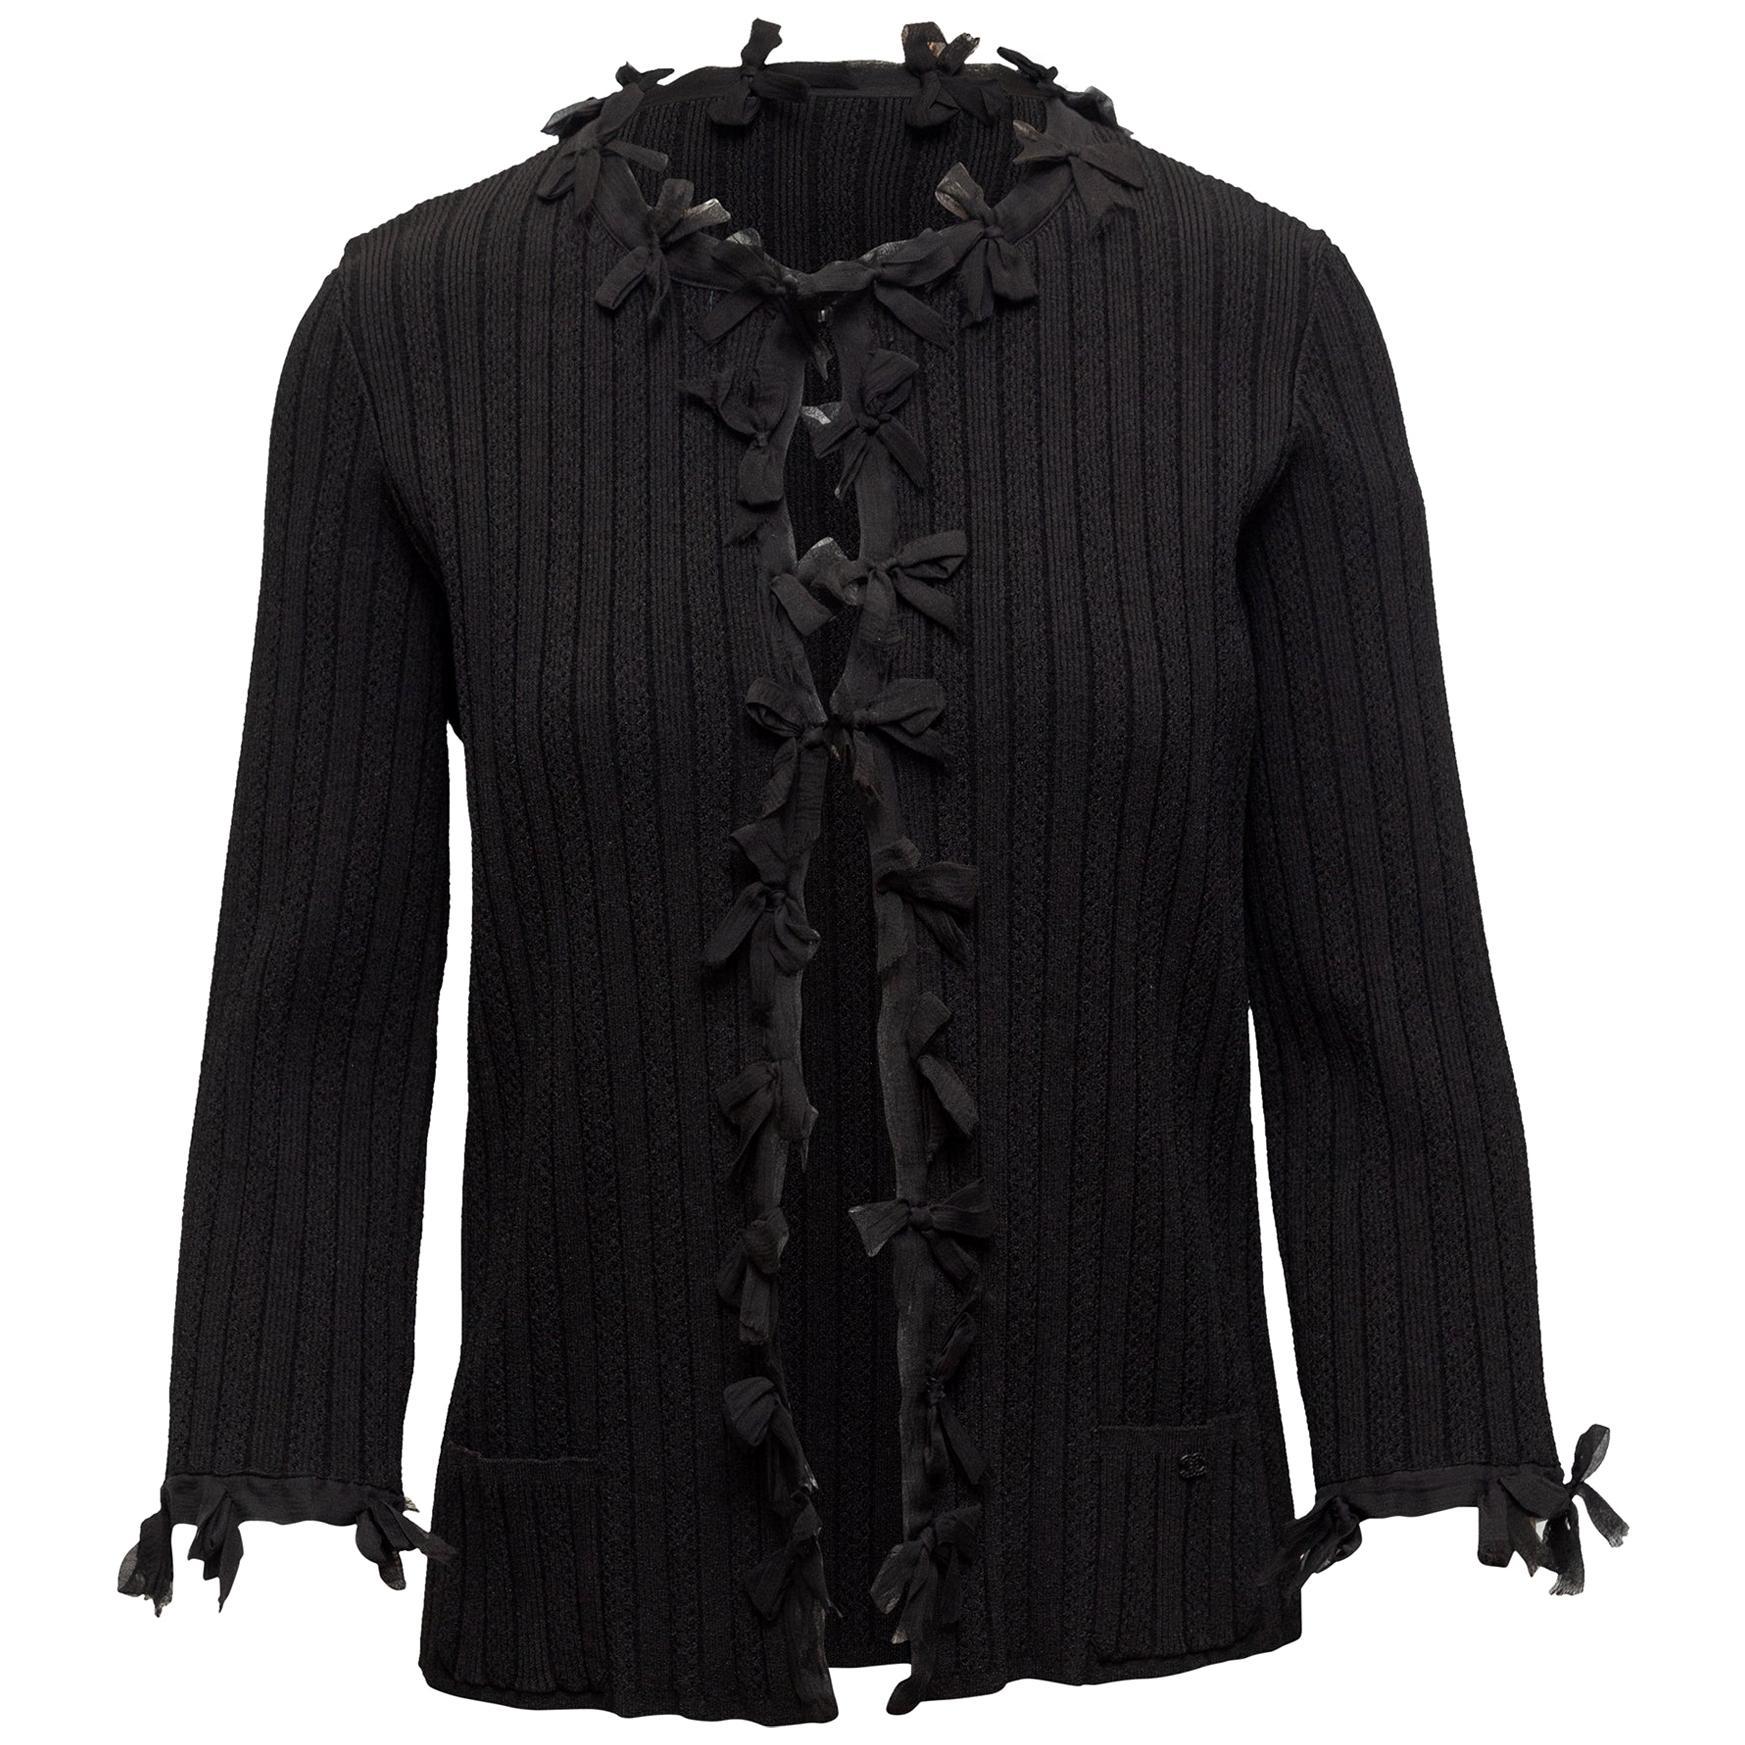 Chanel Black 2006 Rib Knit Bow Cardigan